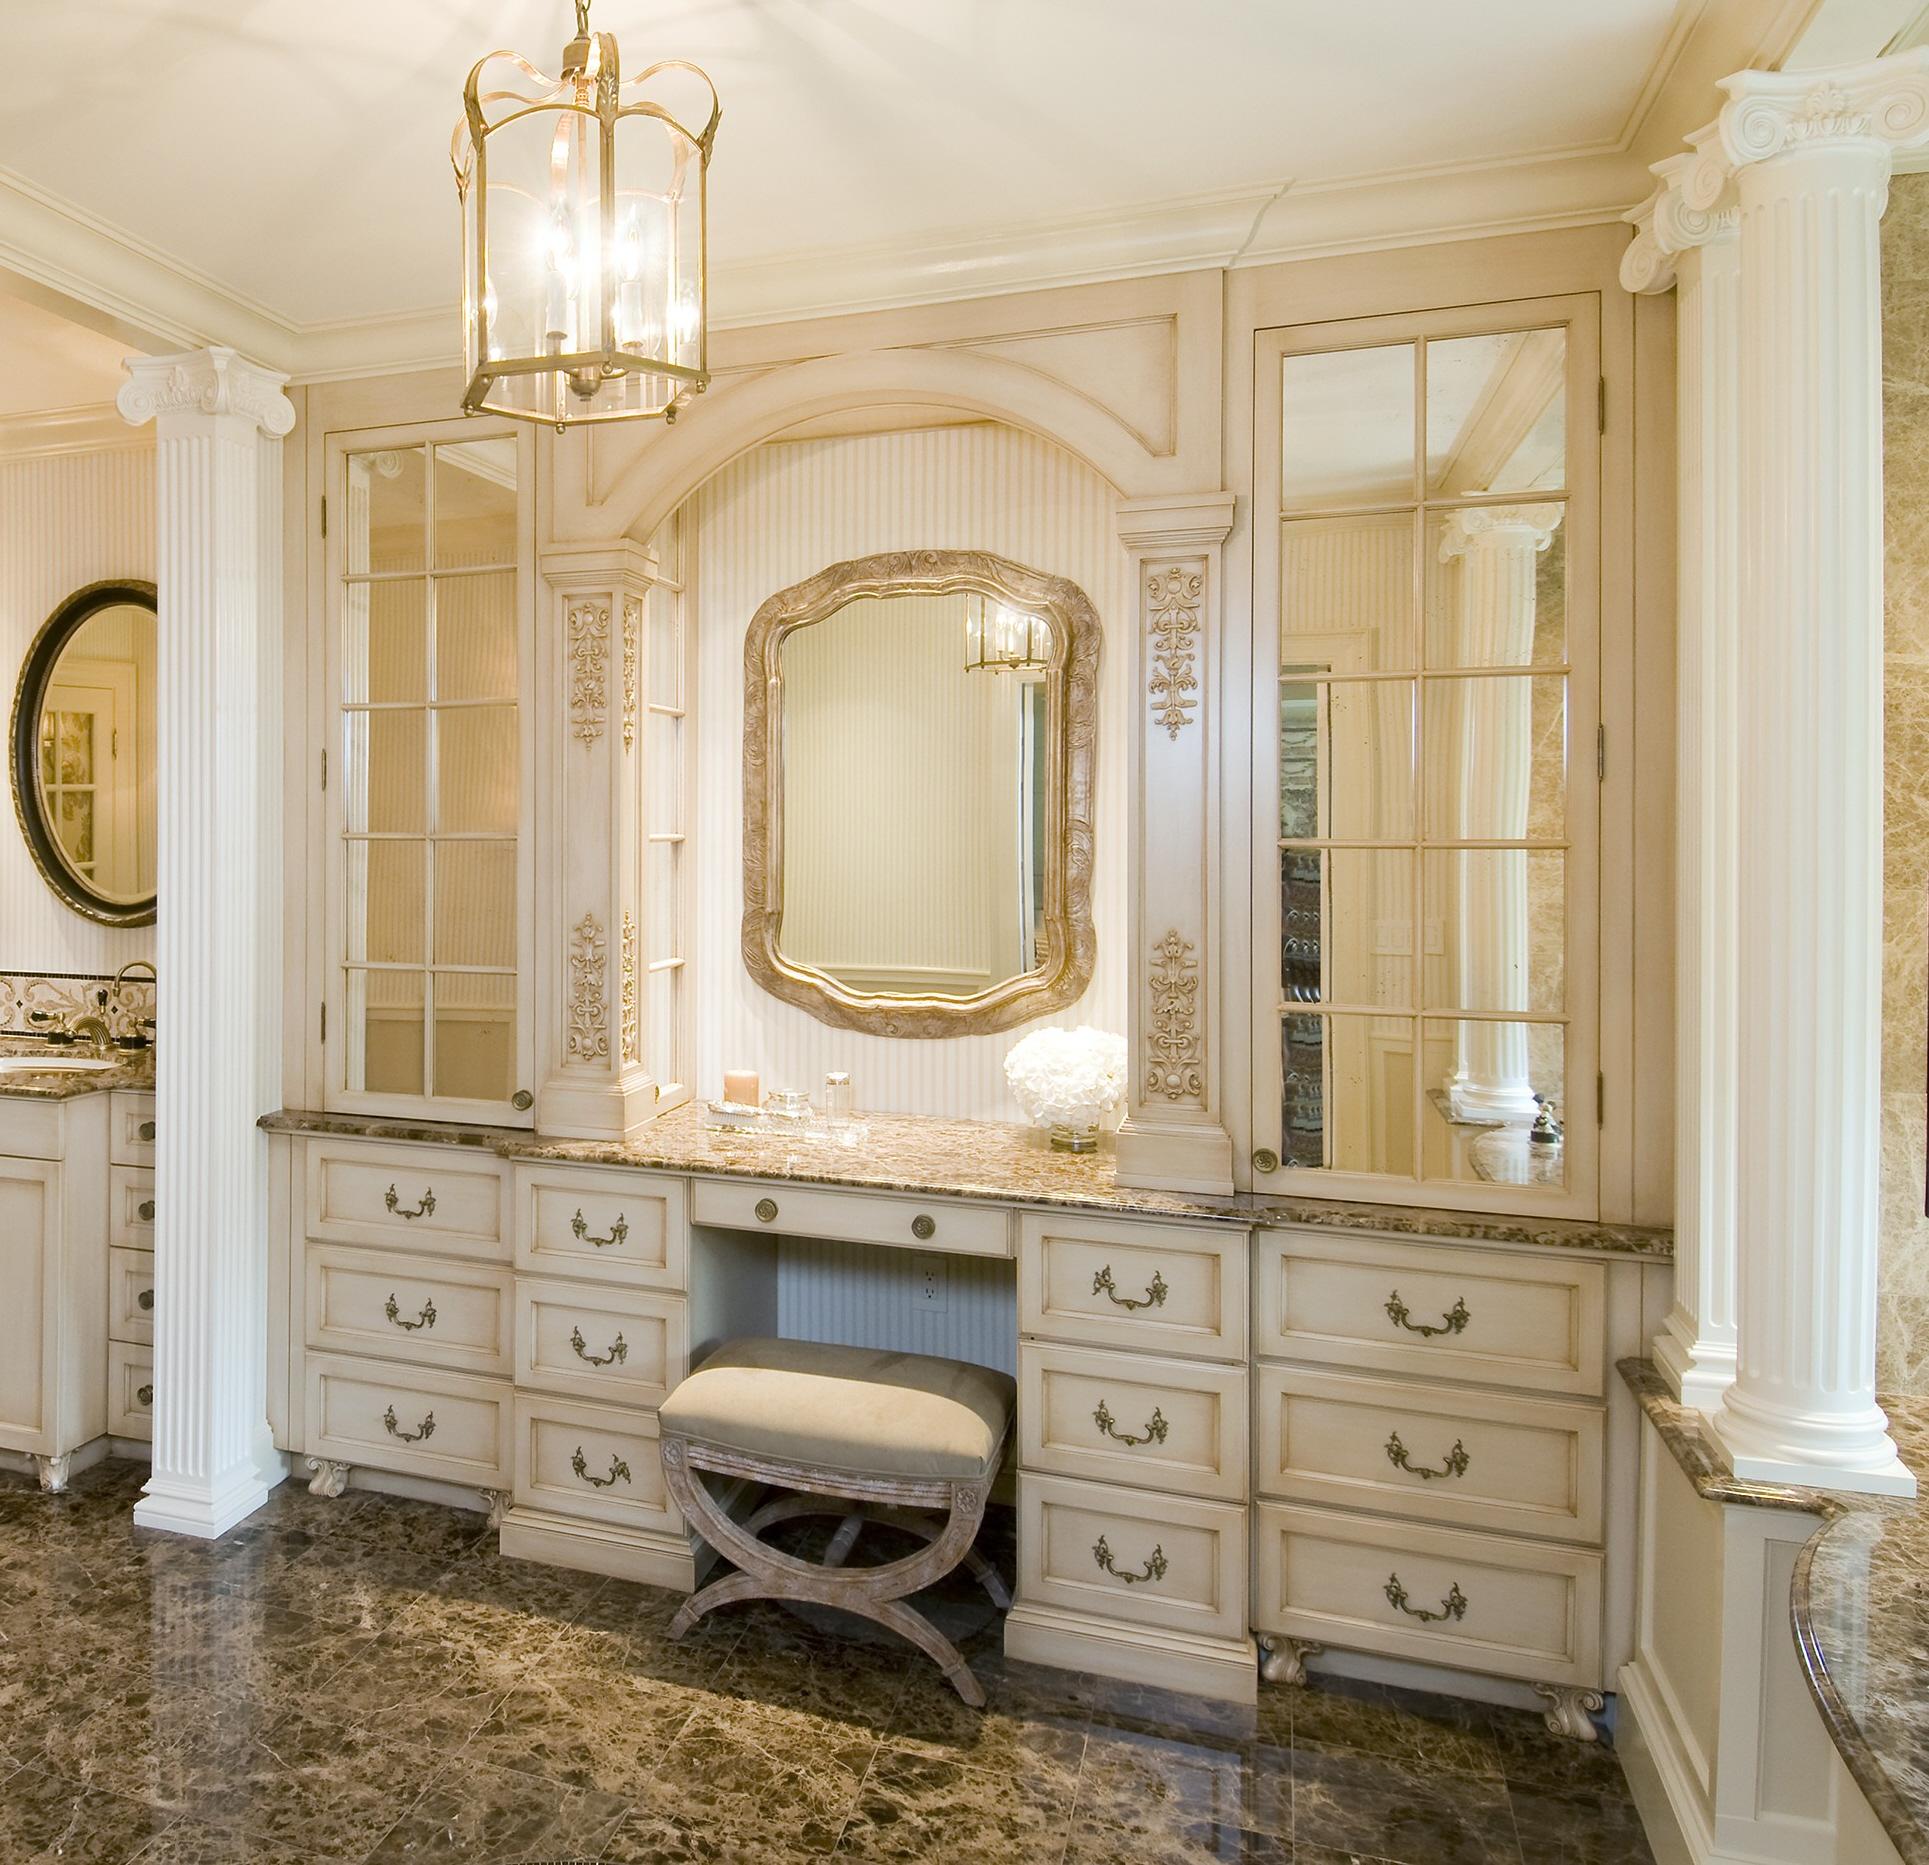 Boston s award winning interior design firm wilson kelsey for Award winning small bathroom designs